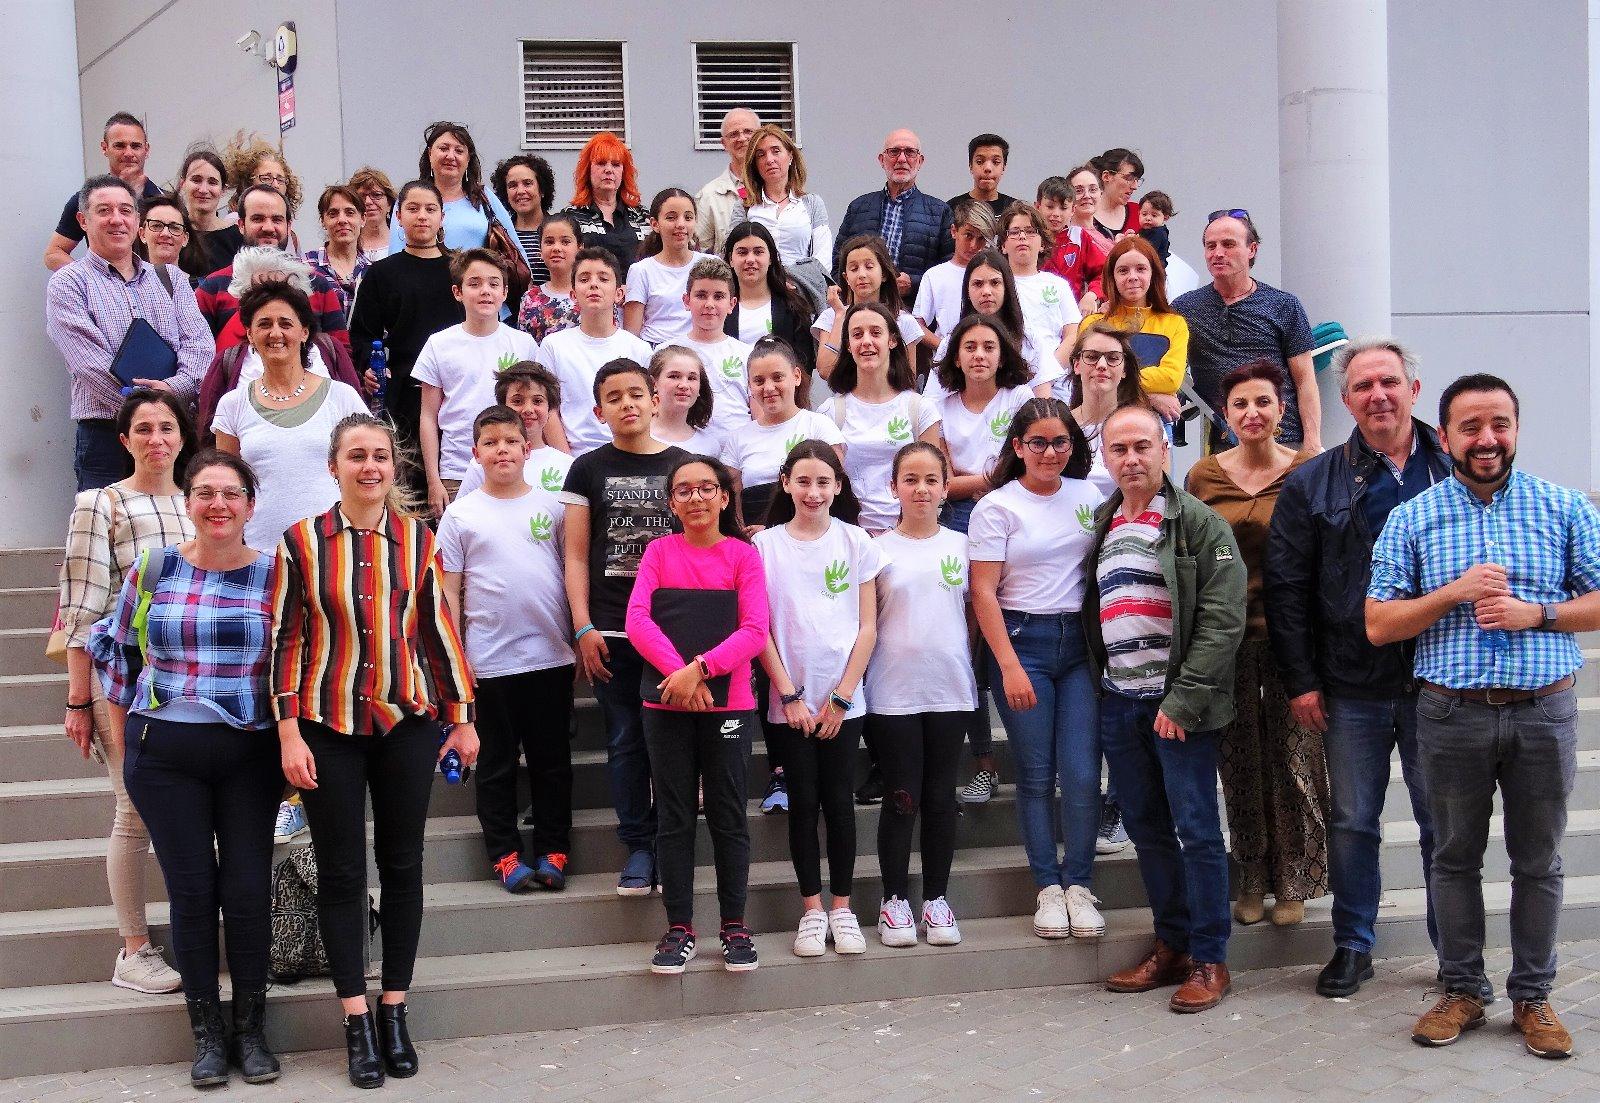 El Consejo Municipal de la Infancia de La Vall d'Uixó plantea demandas a los grupos políticos